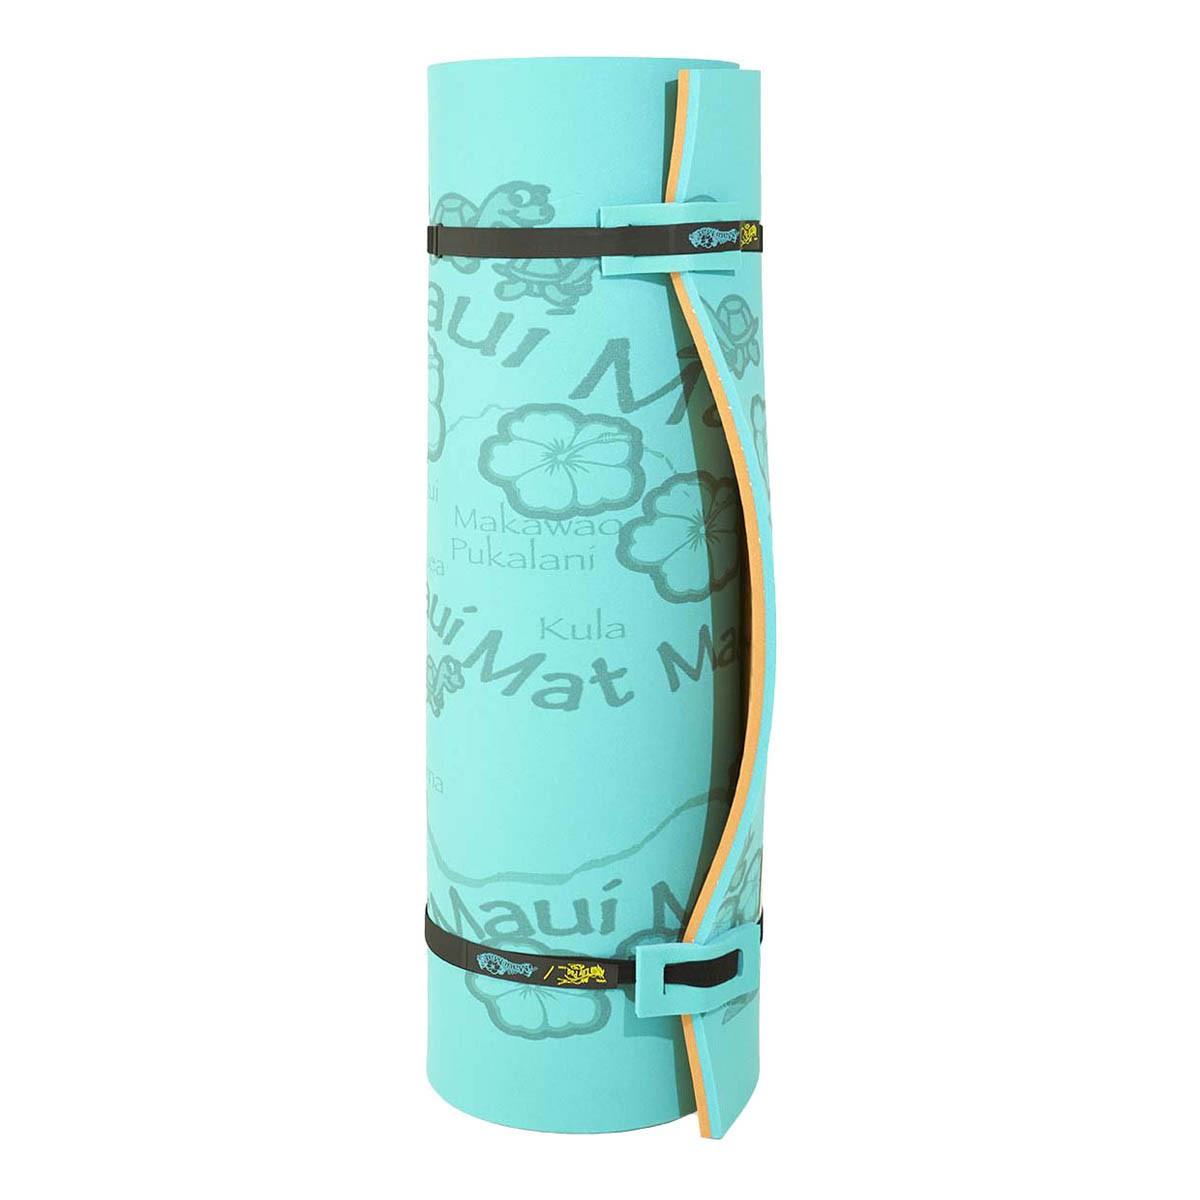 "Aqua Lily Maui Mat Pad - 14' x 6' x 1 3/8"""